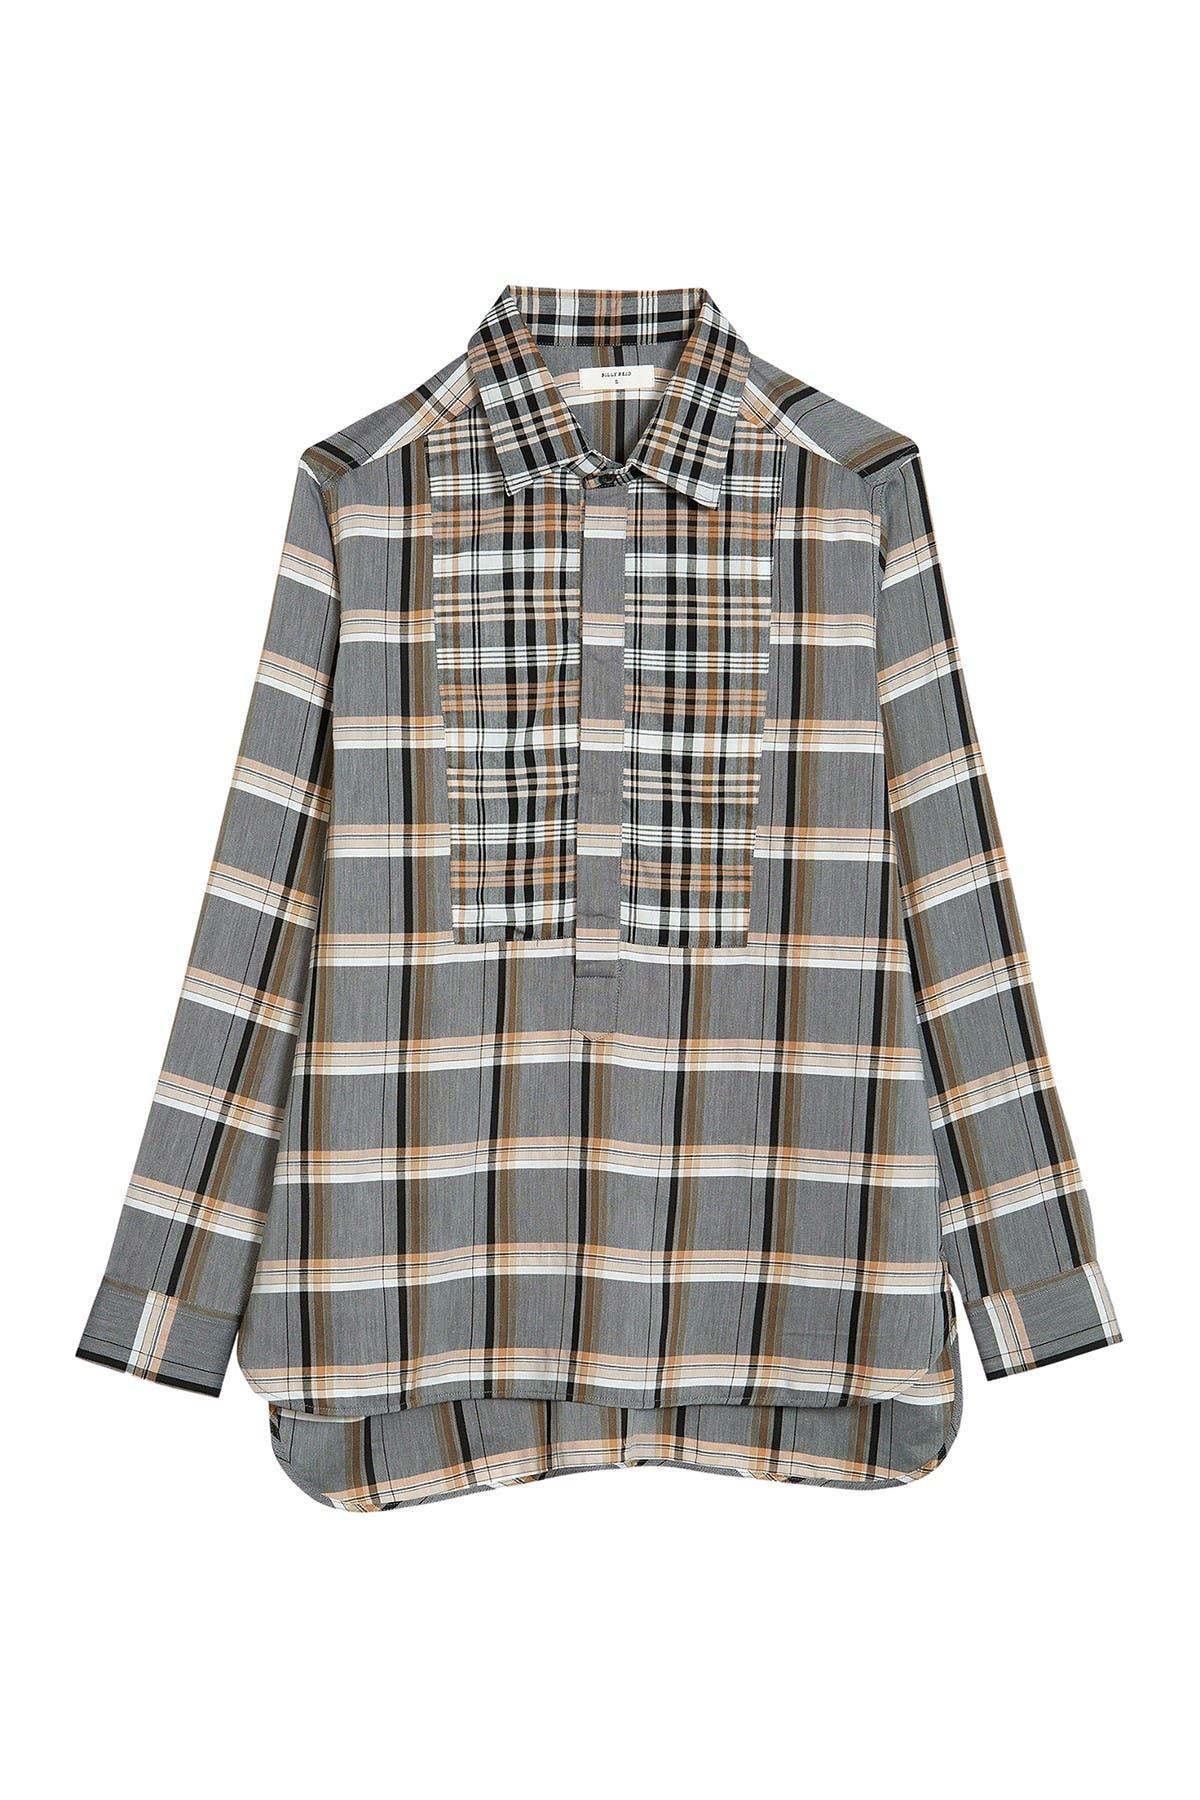 Image of Billy Reid Paneled Popover Shirt